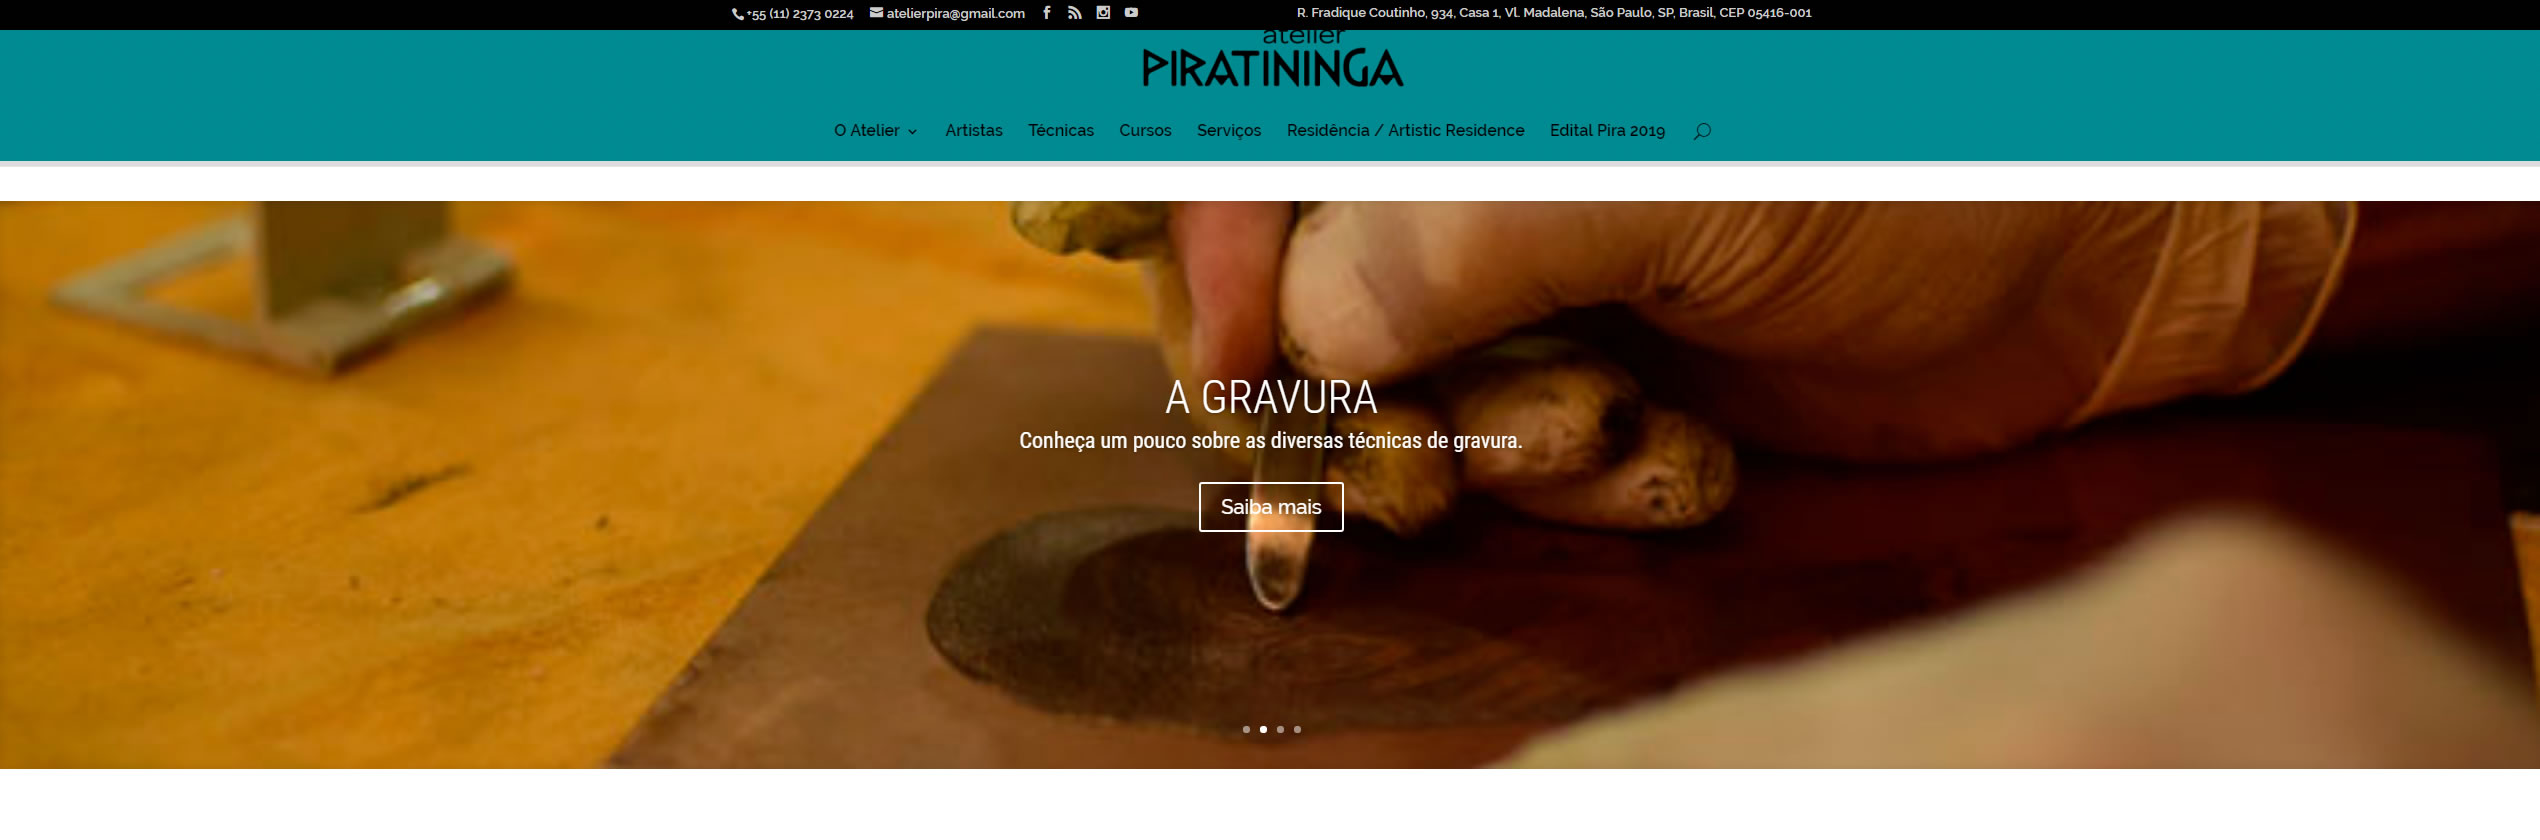 atelie_piratininga_galeria_de_gravura